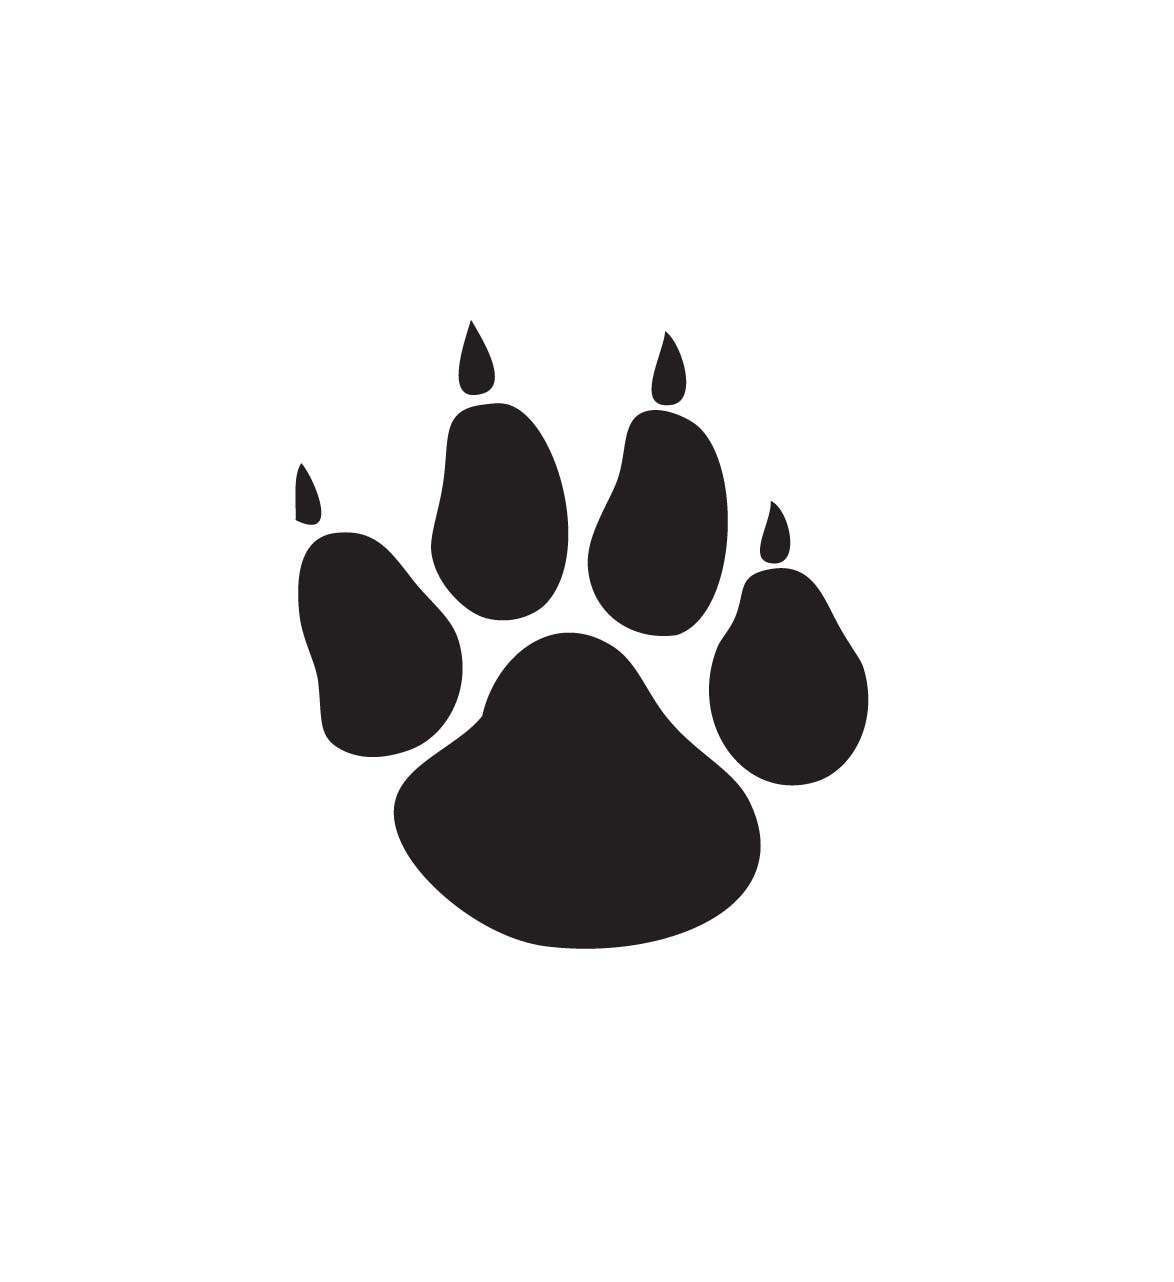 Dog paw print clip art free download 3